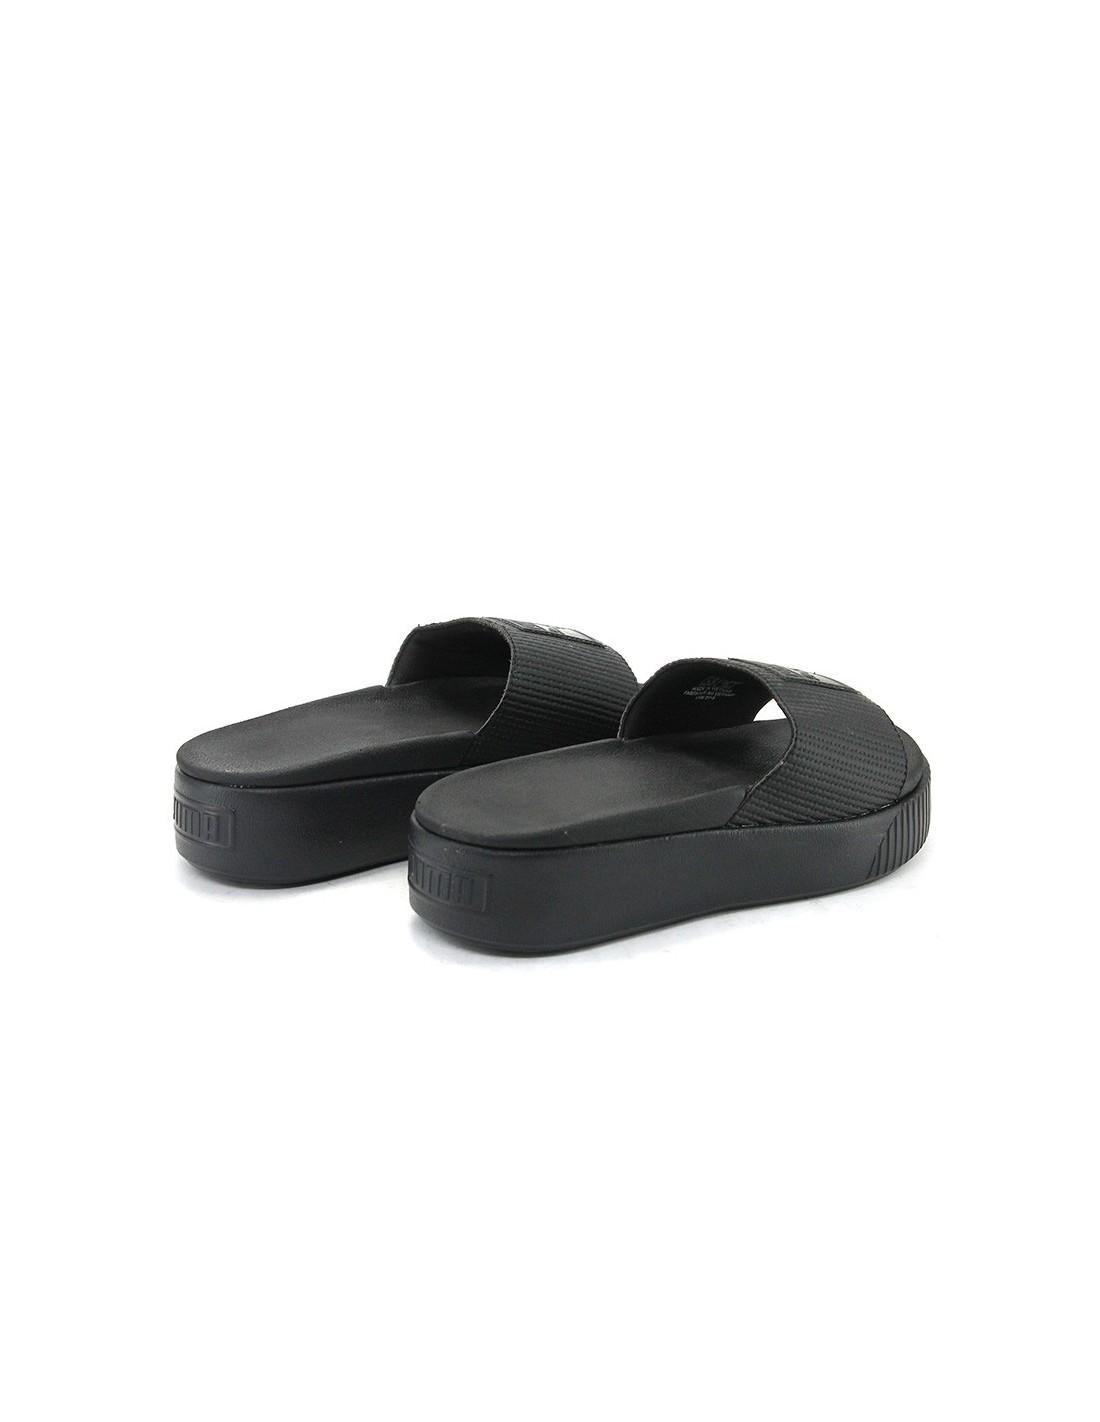 26bde8117e6 New Puma slipper PLATFORM SLIDE Wns EP 366122 black online